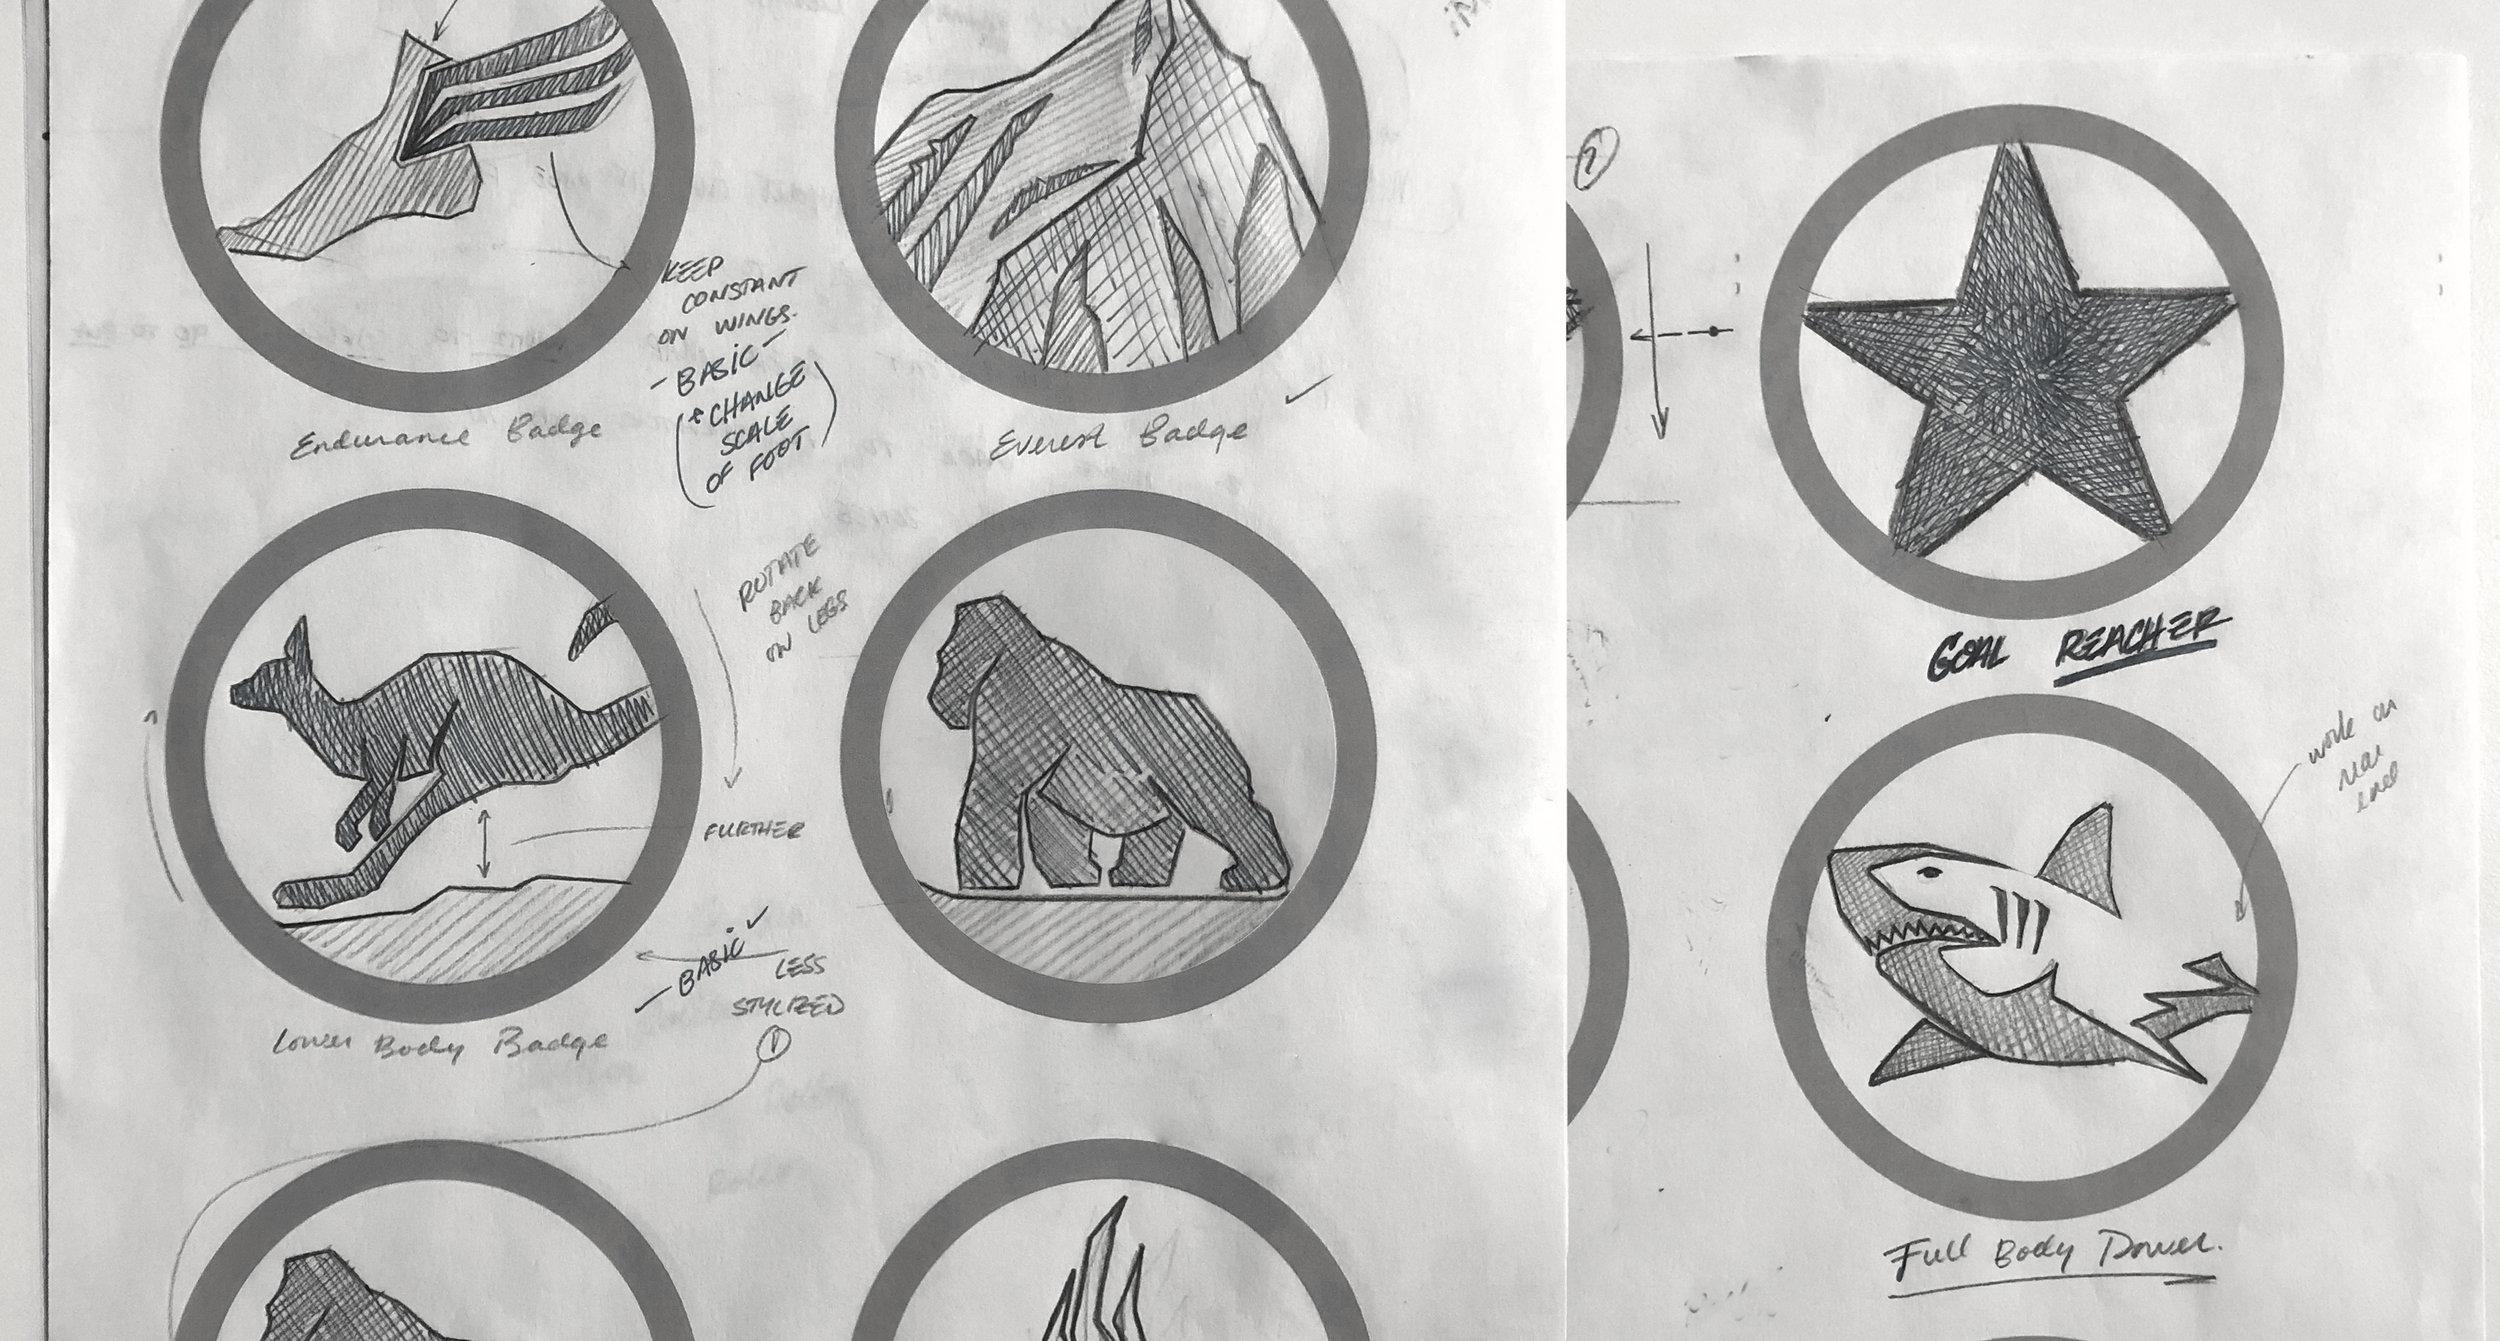 EXOS_AdultTrainingBadges_Sketches.jpg